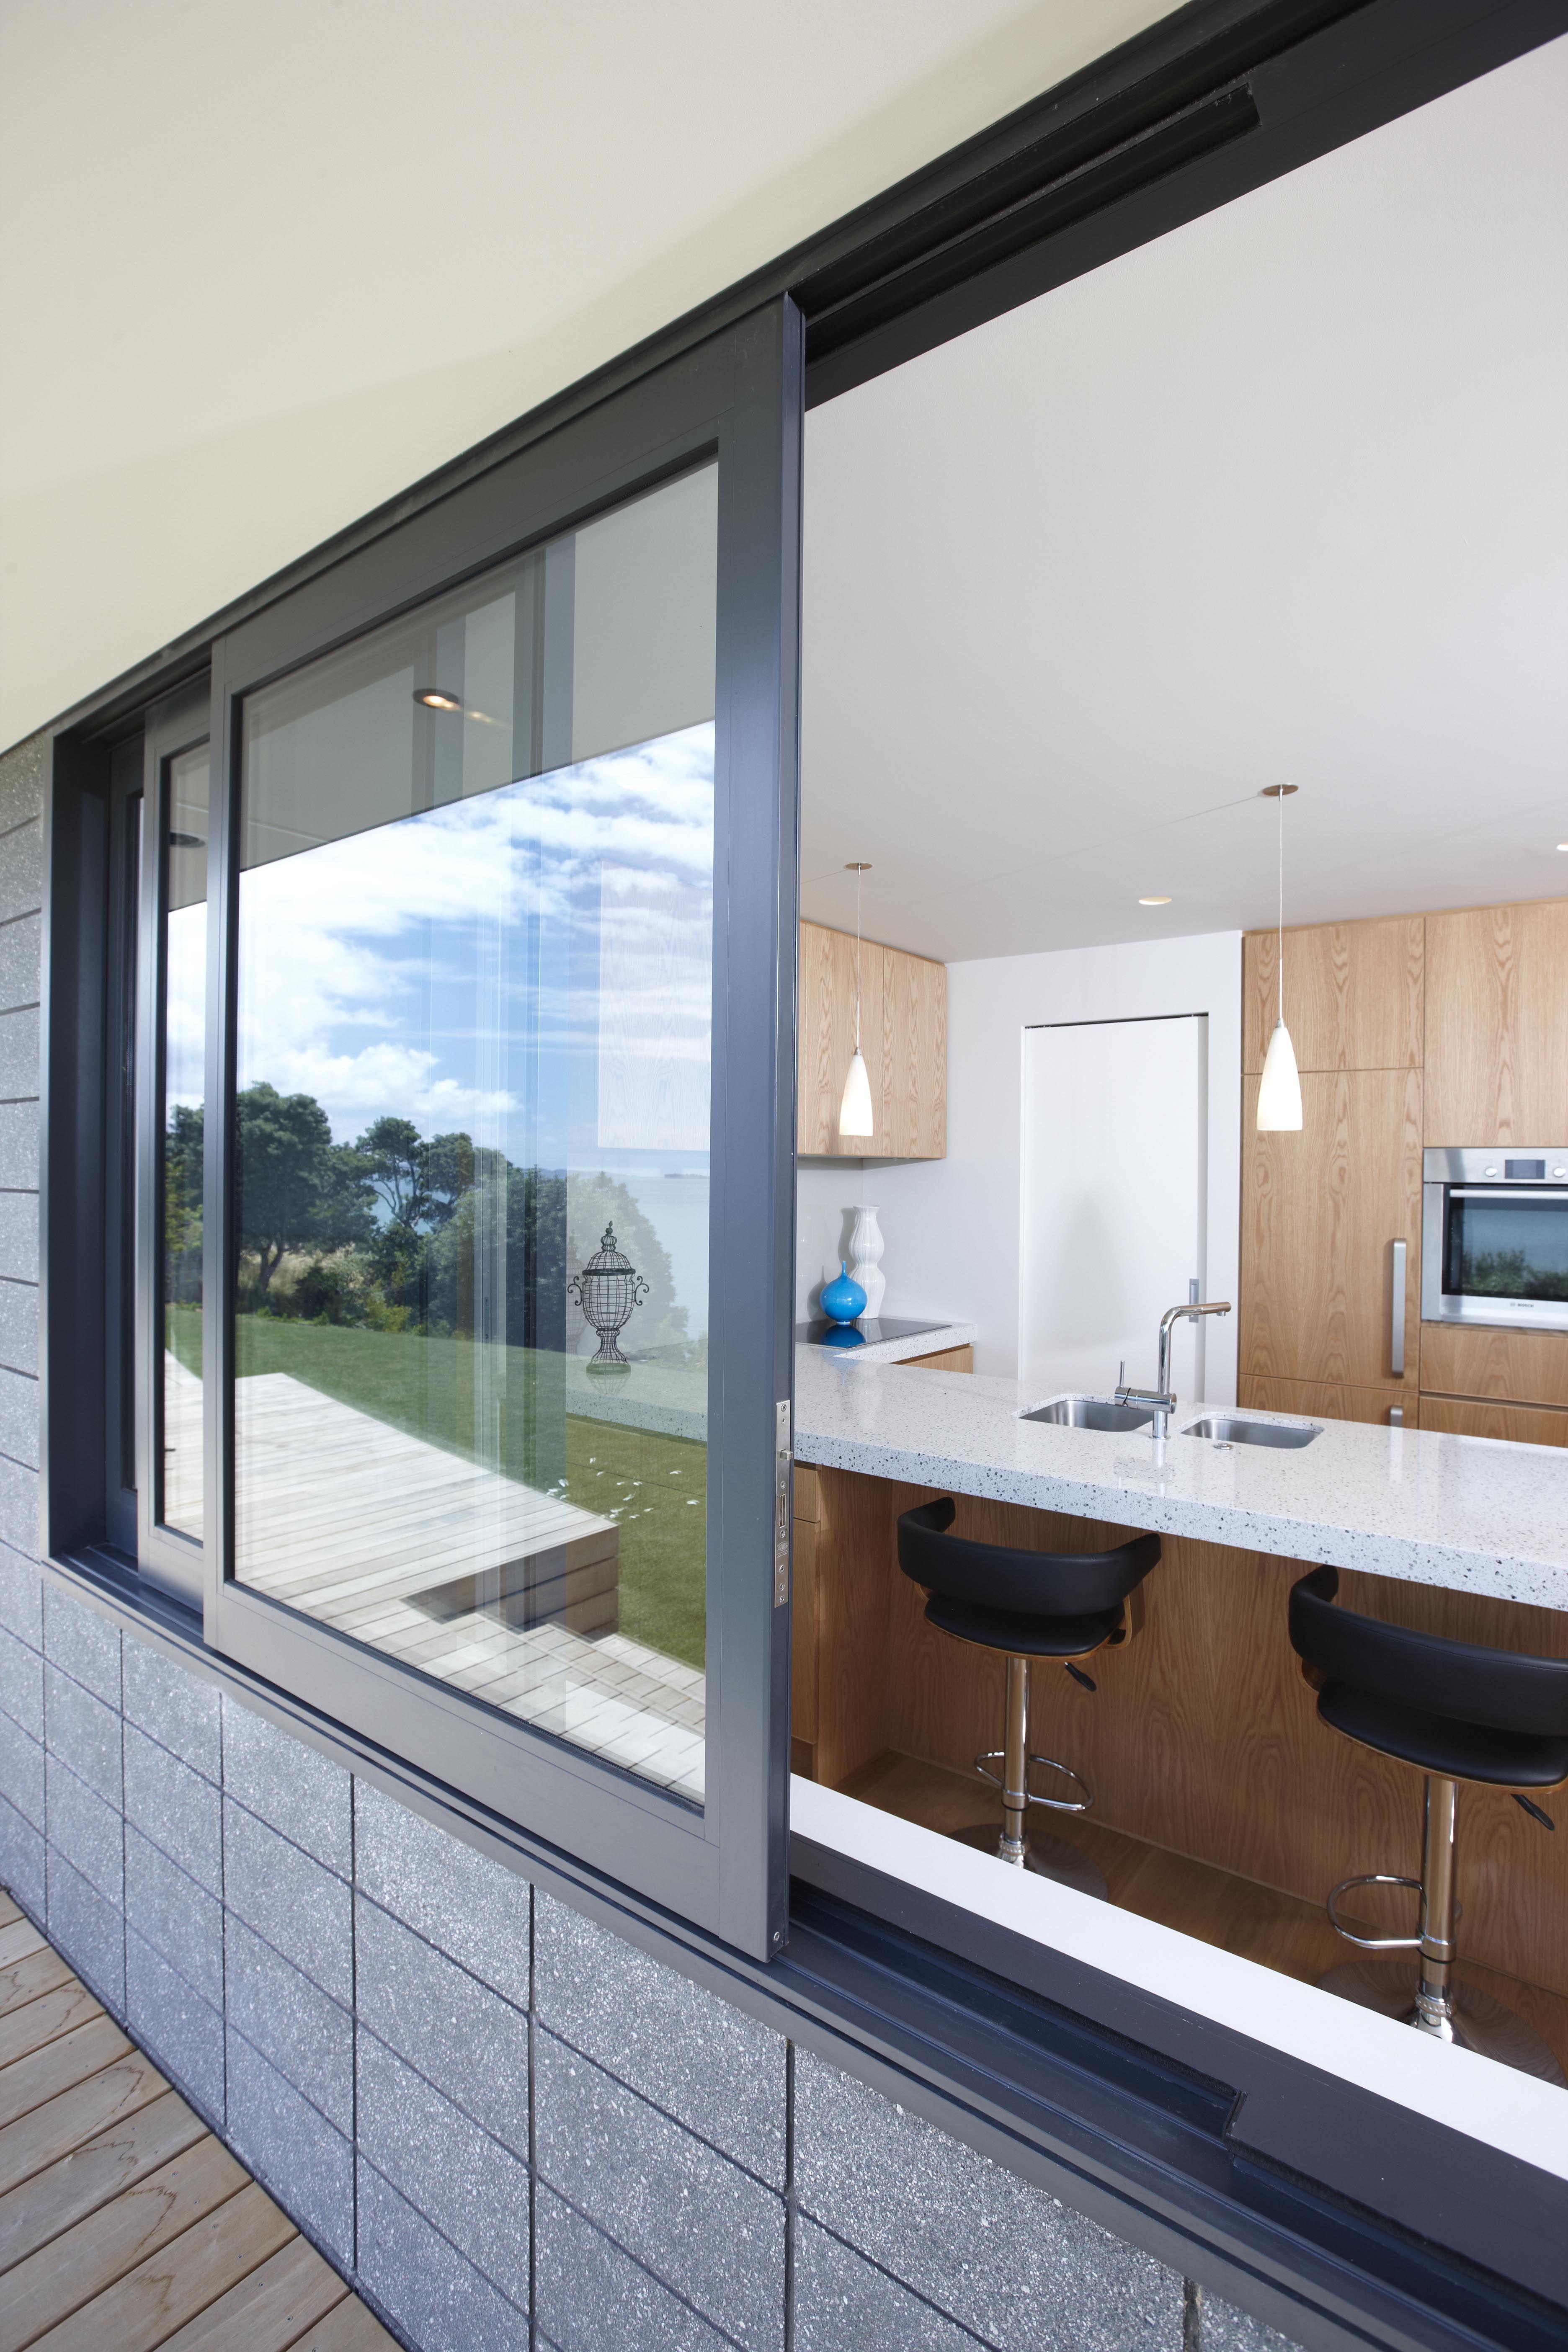 Pin By Zahlee On Brumbies Kitchen Inspo In 2020 Sliding Windows Kitchen Modern Windows Aluminium Windows